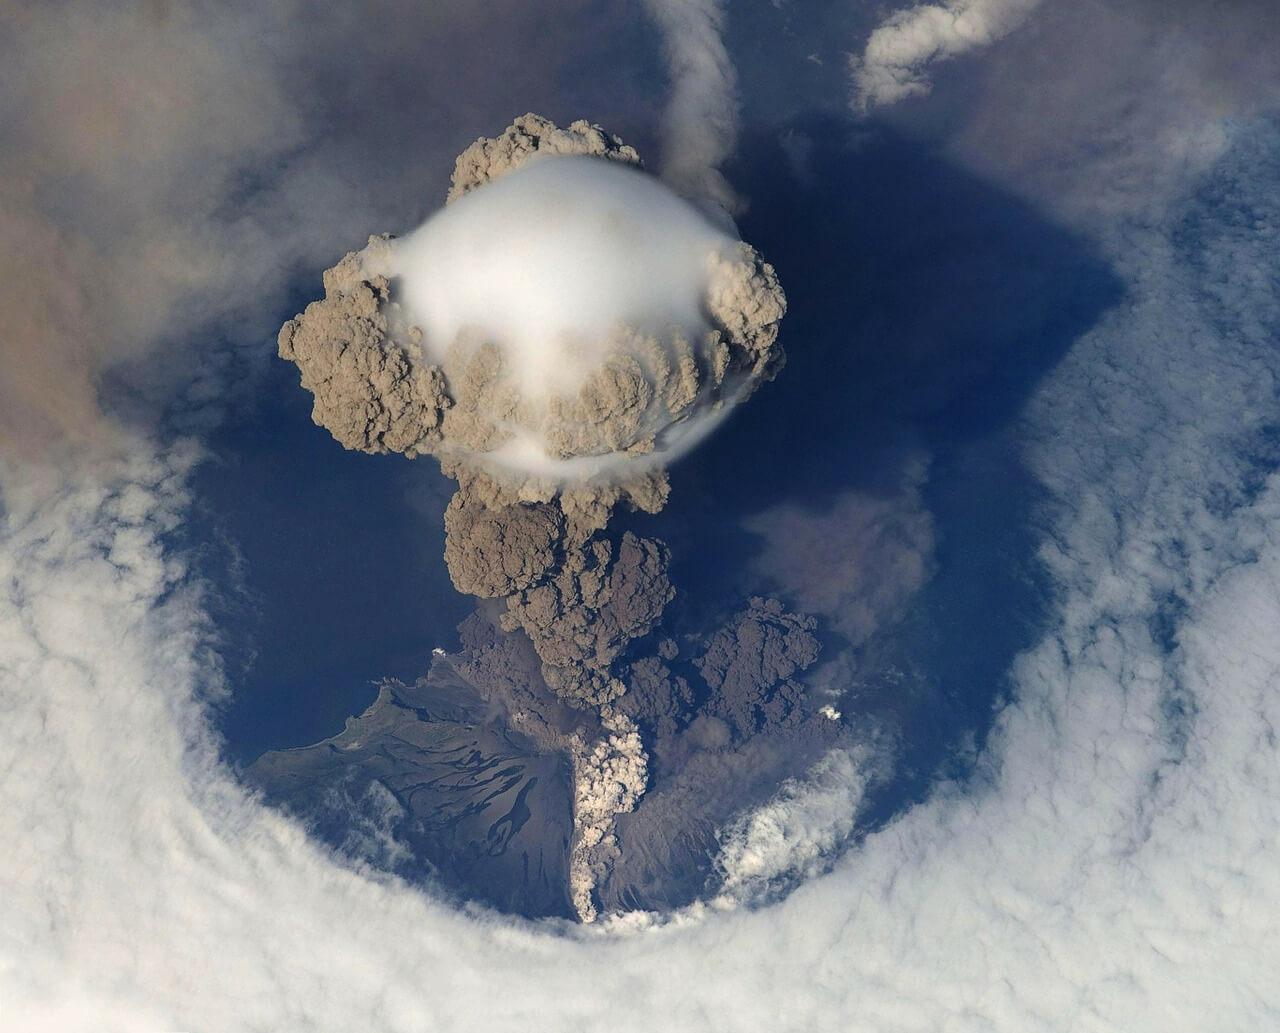 volcanic-eruption-67668_1280.jpg